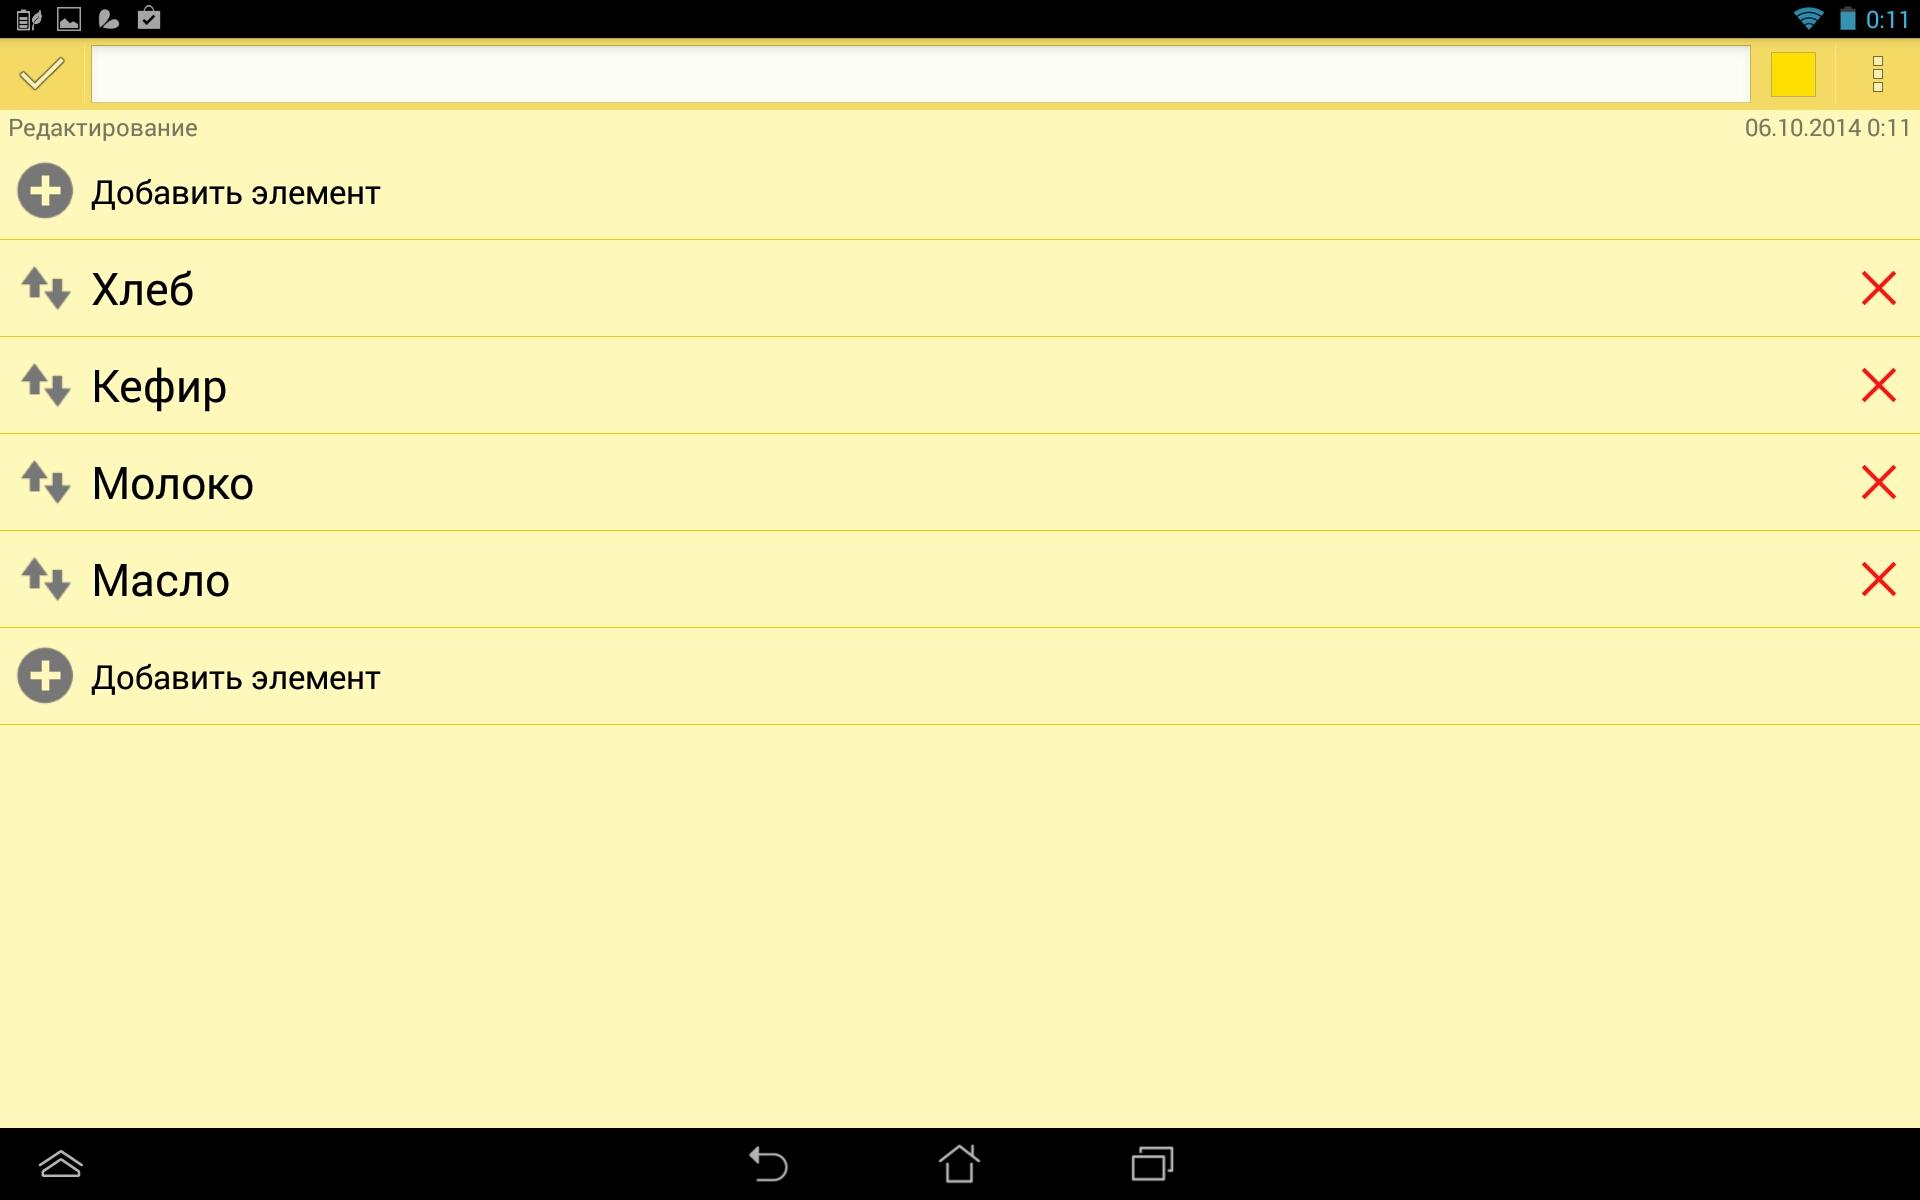 Заметка списком в ColorNote